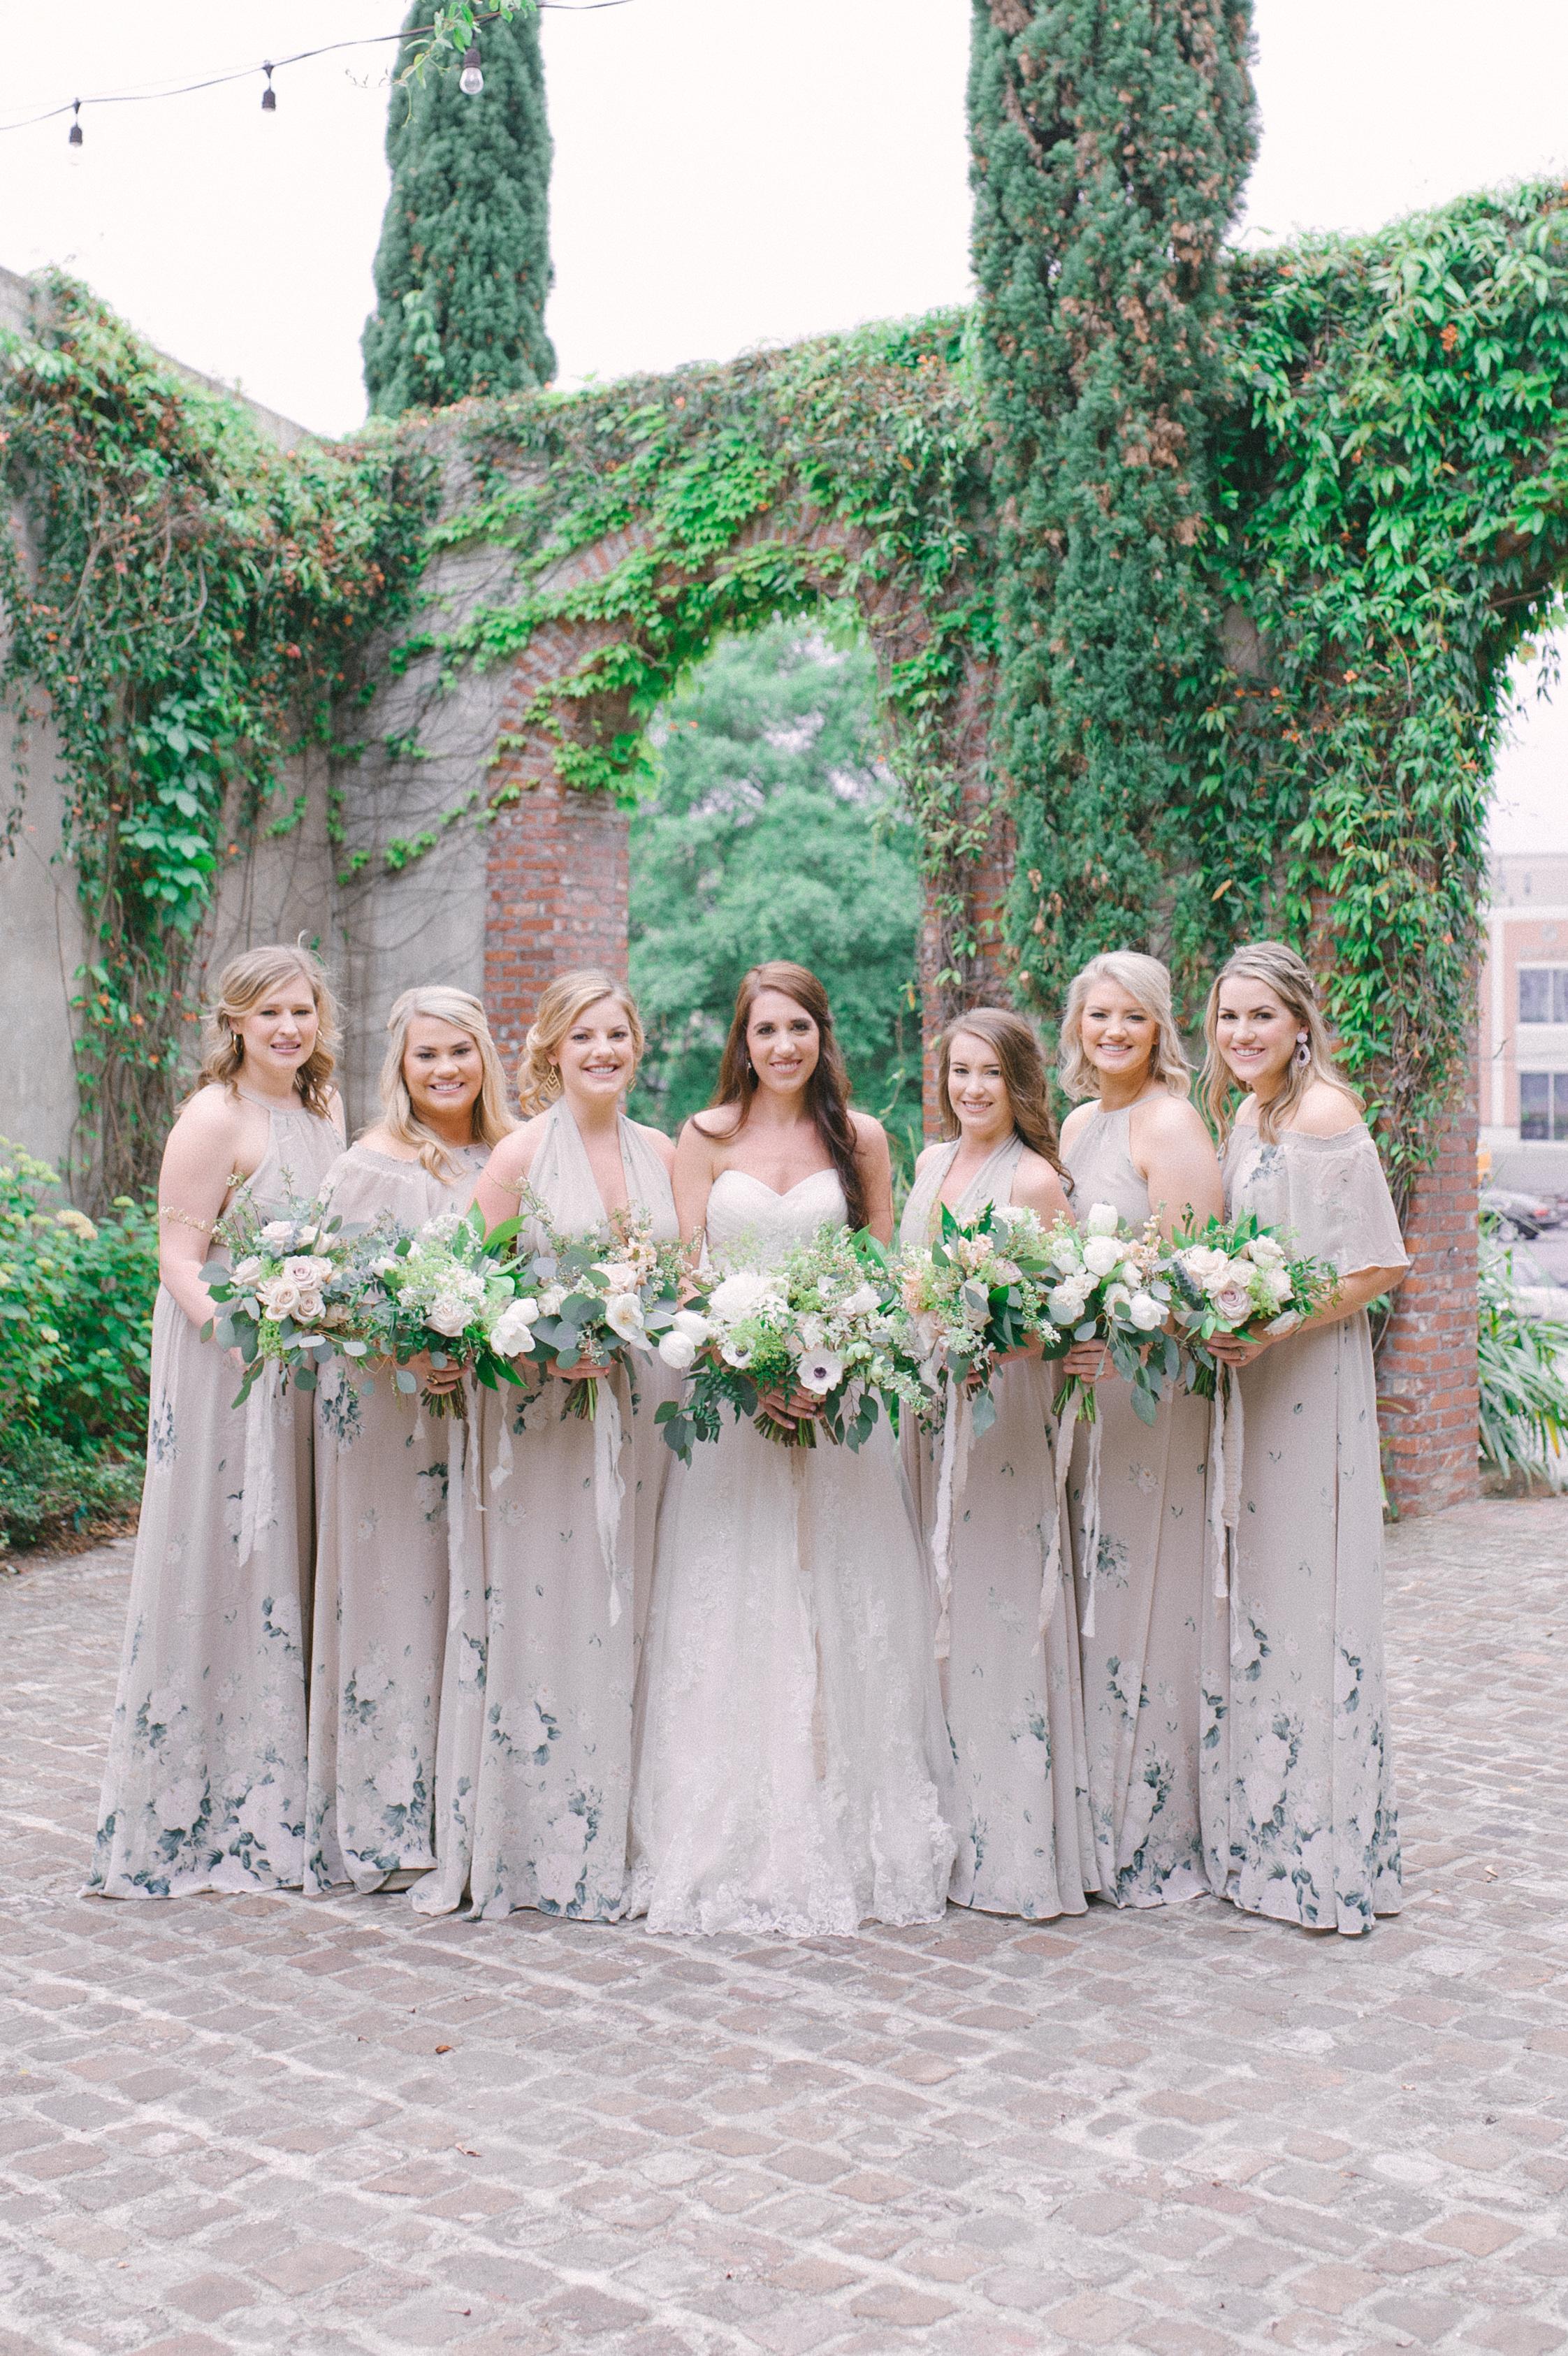 Romantic-Summerour-studio-wedding-hannah-forsberg-atlanta-wedding-photographer29.JPG